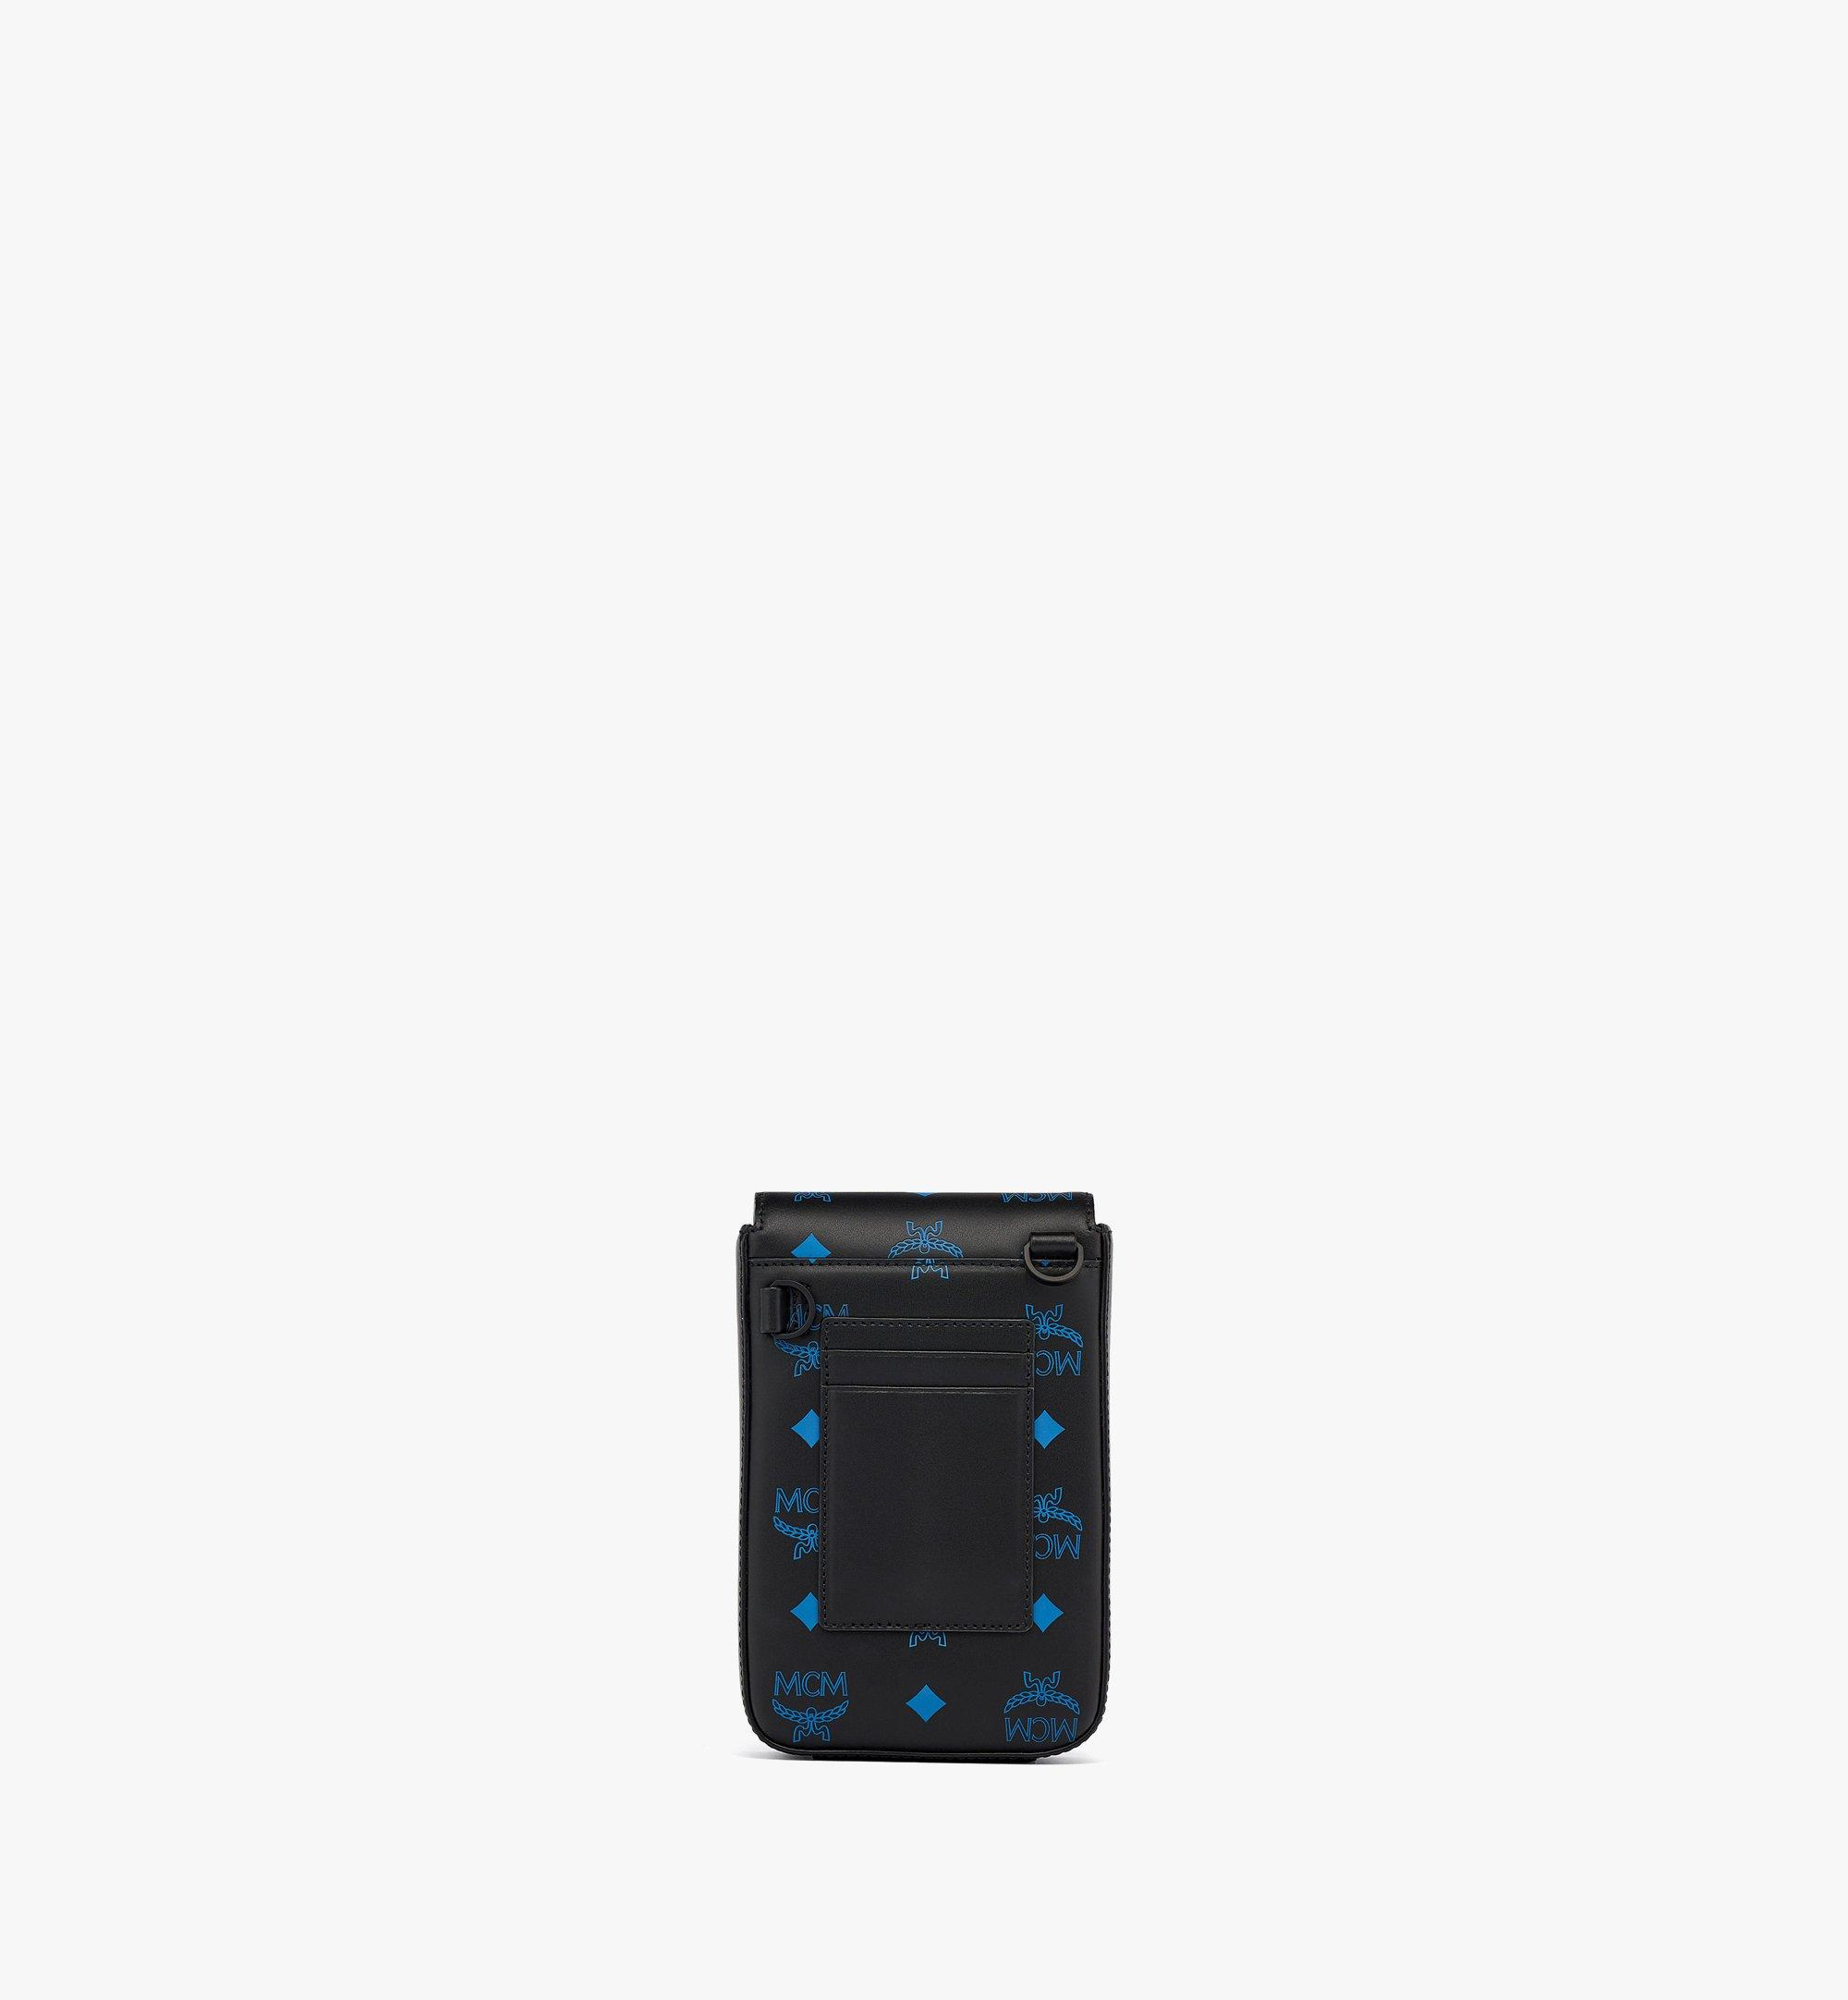 MCM N/S Crossbody in Color Splash Logo Leather Blue MMRBASX04H9001 Alternate View 3